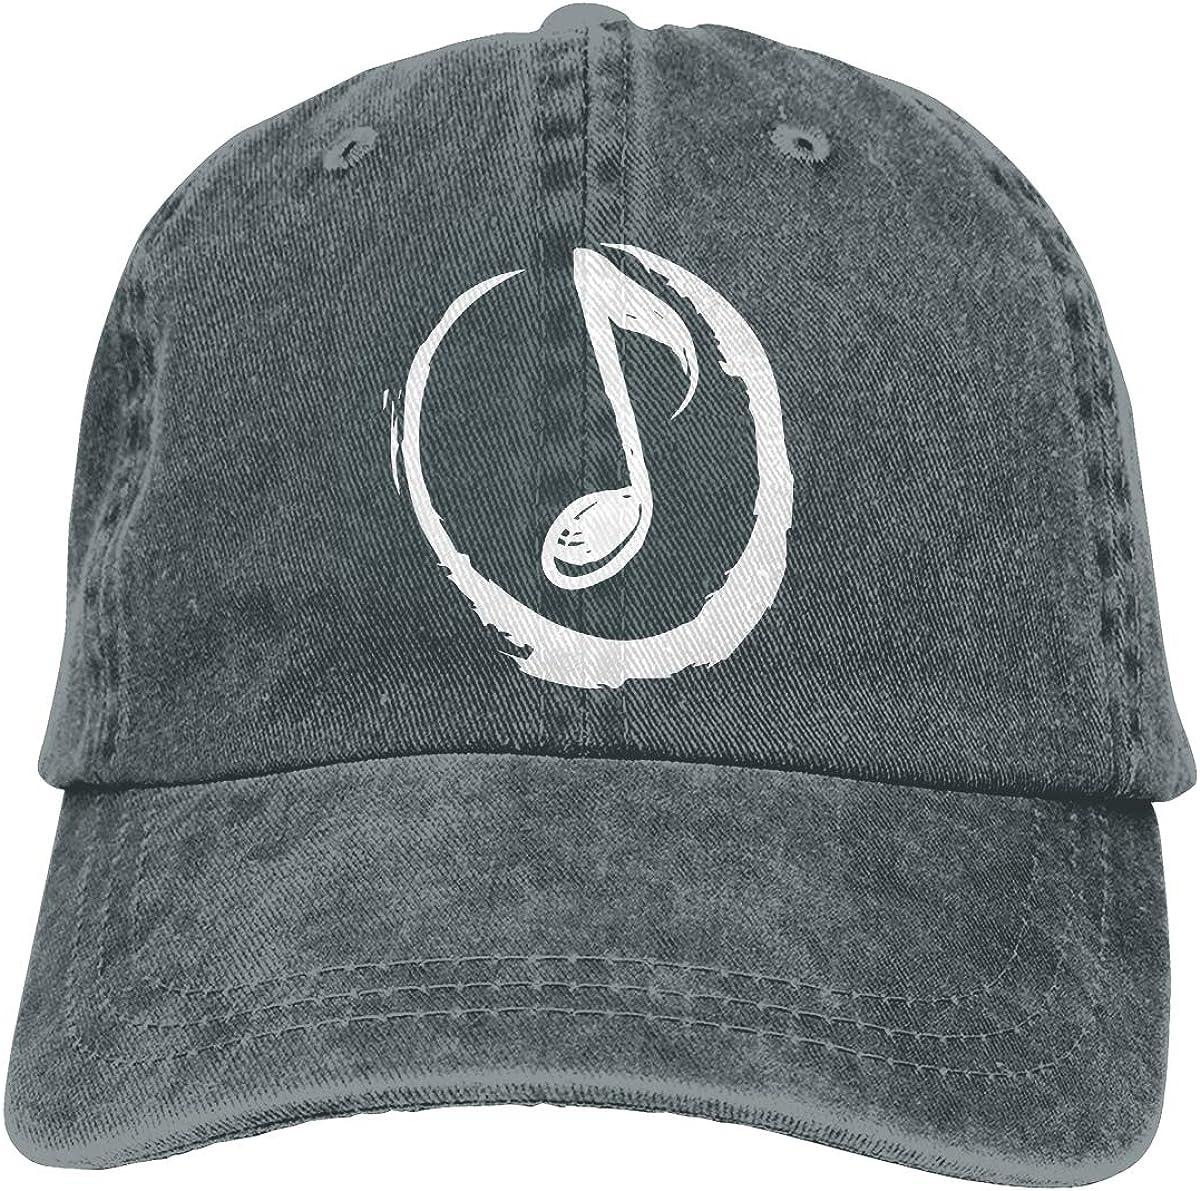 Adult Fashion Cotton Denim Baseball Cap Round Music Note Classic Dad Hat Adjustable Plain Cap